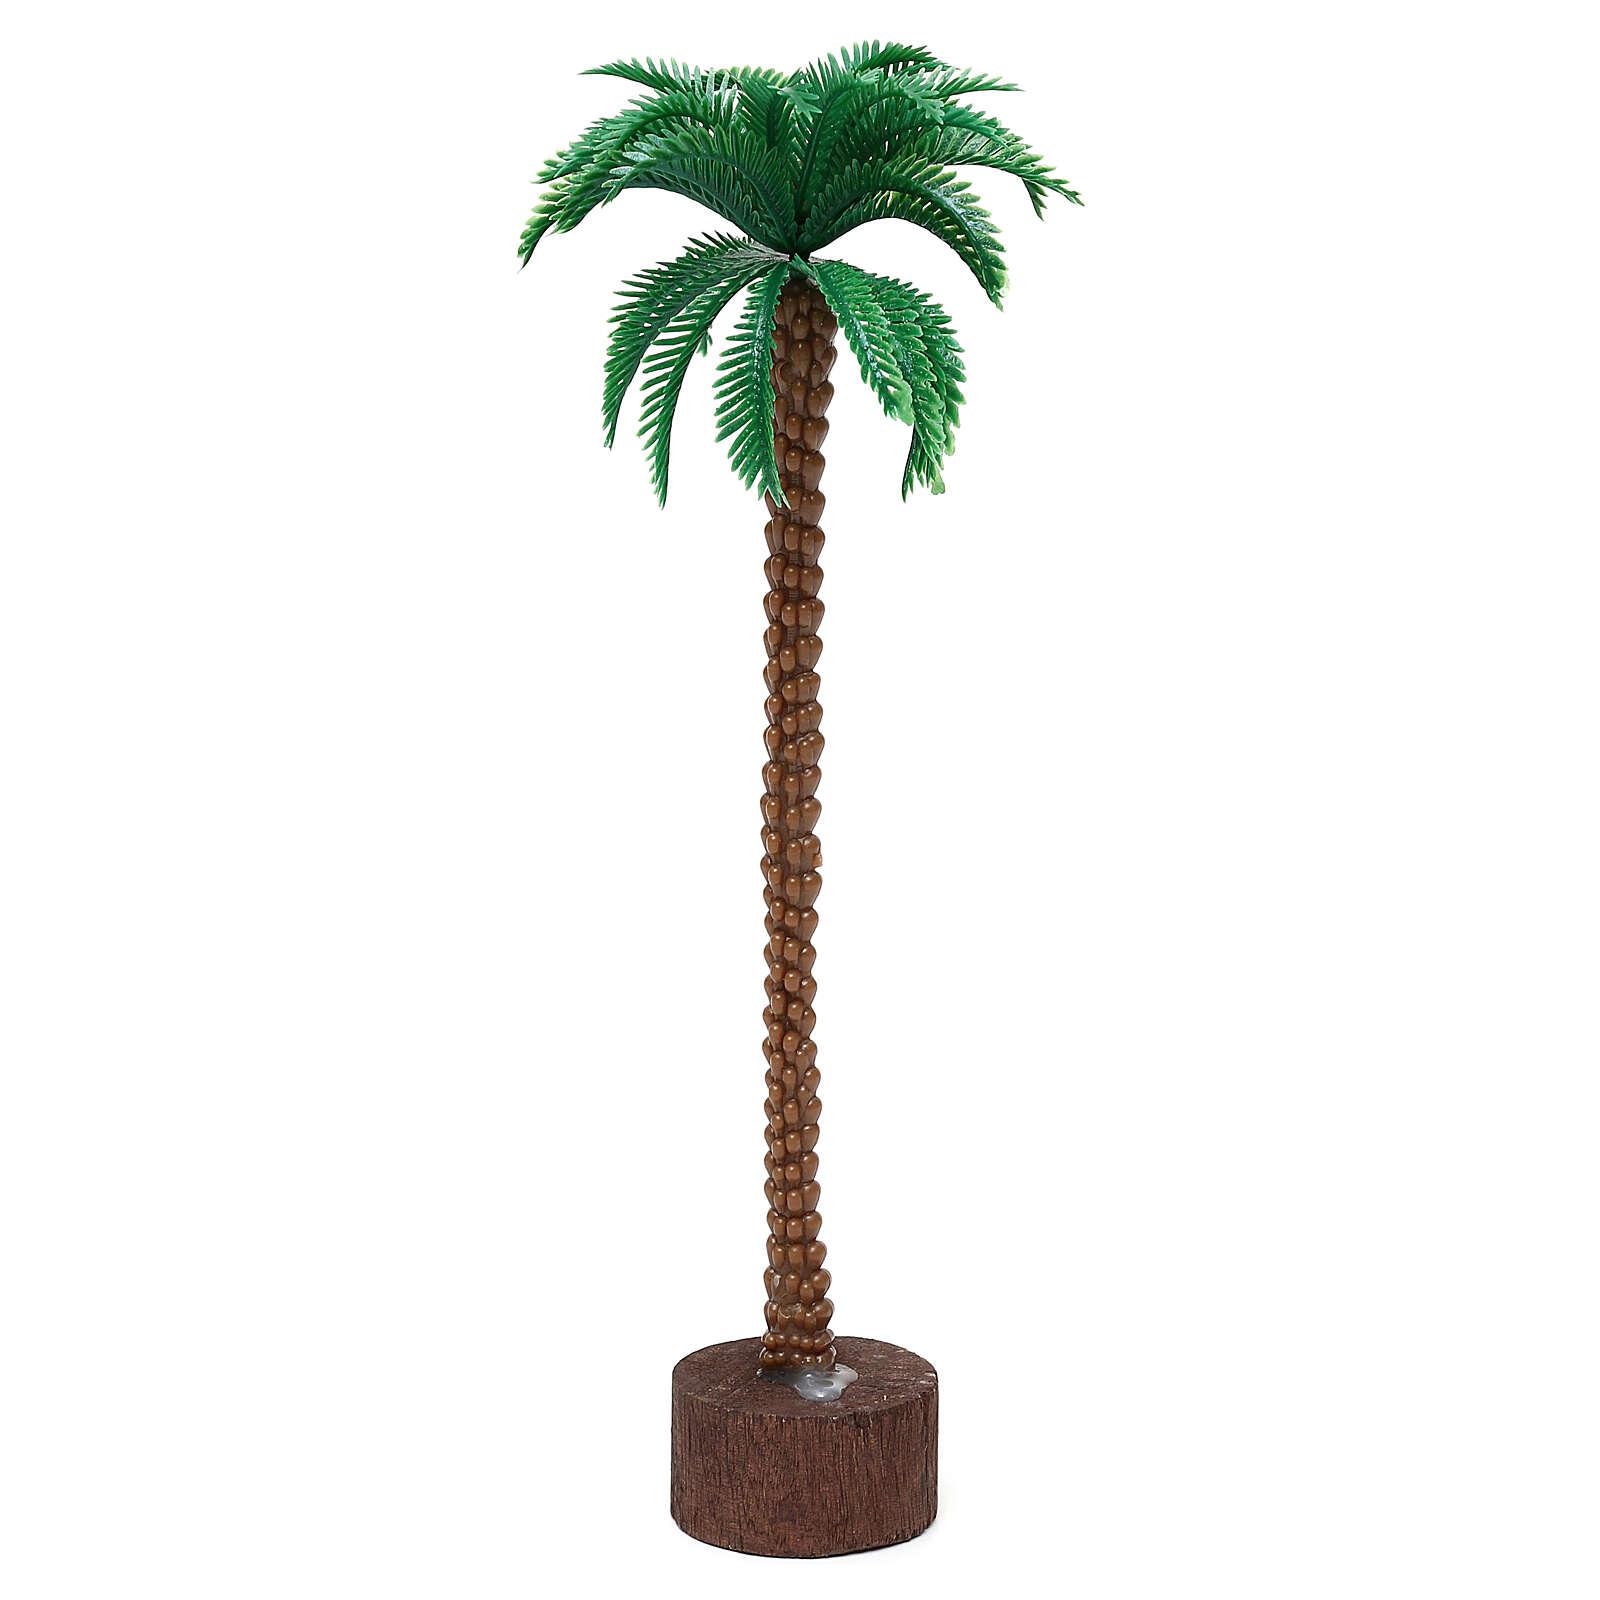 Grafted palm tree figurine 20 cm, for 10-11 cm nativity 4